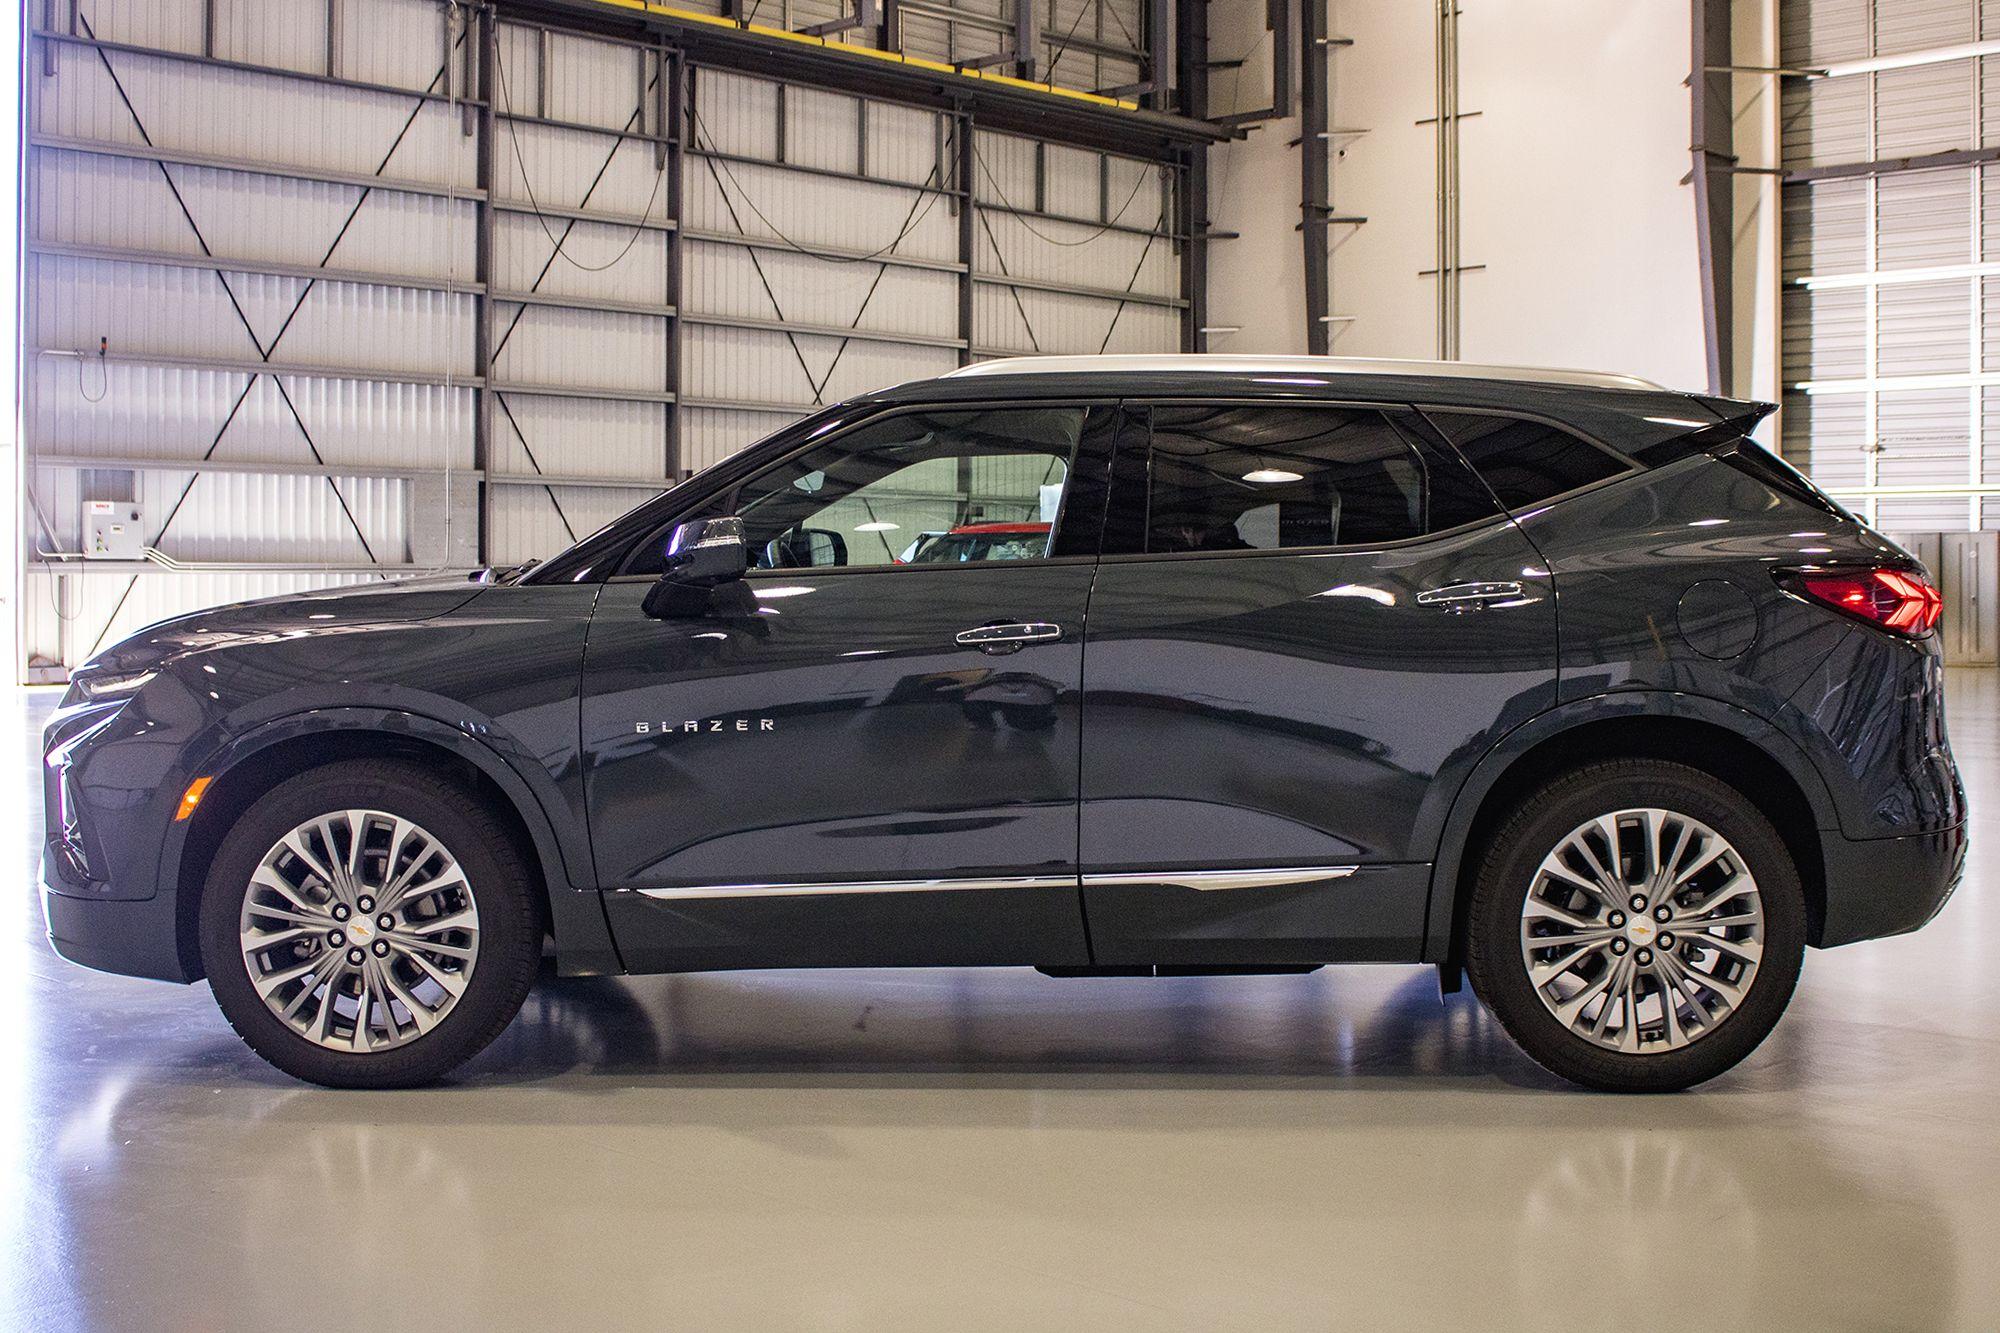 2019 Chevrolet Blazer Review A Crossover Comeback, With